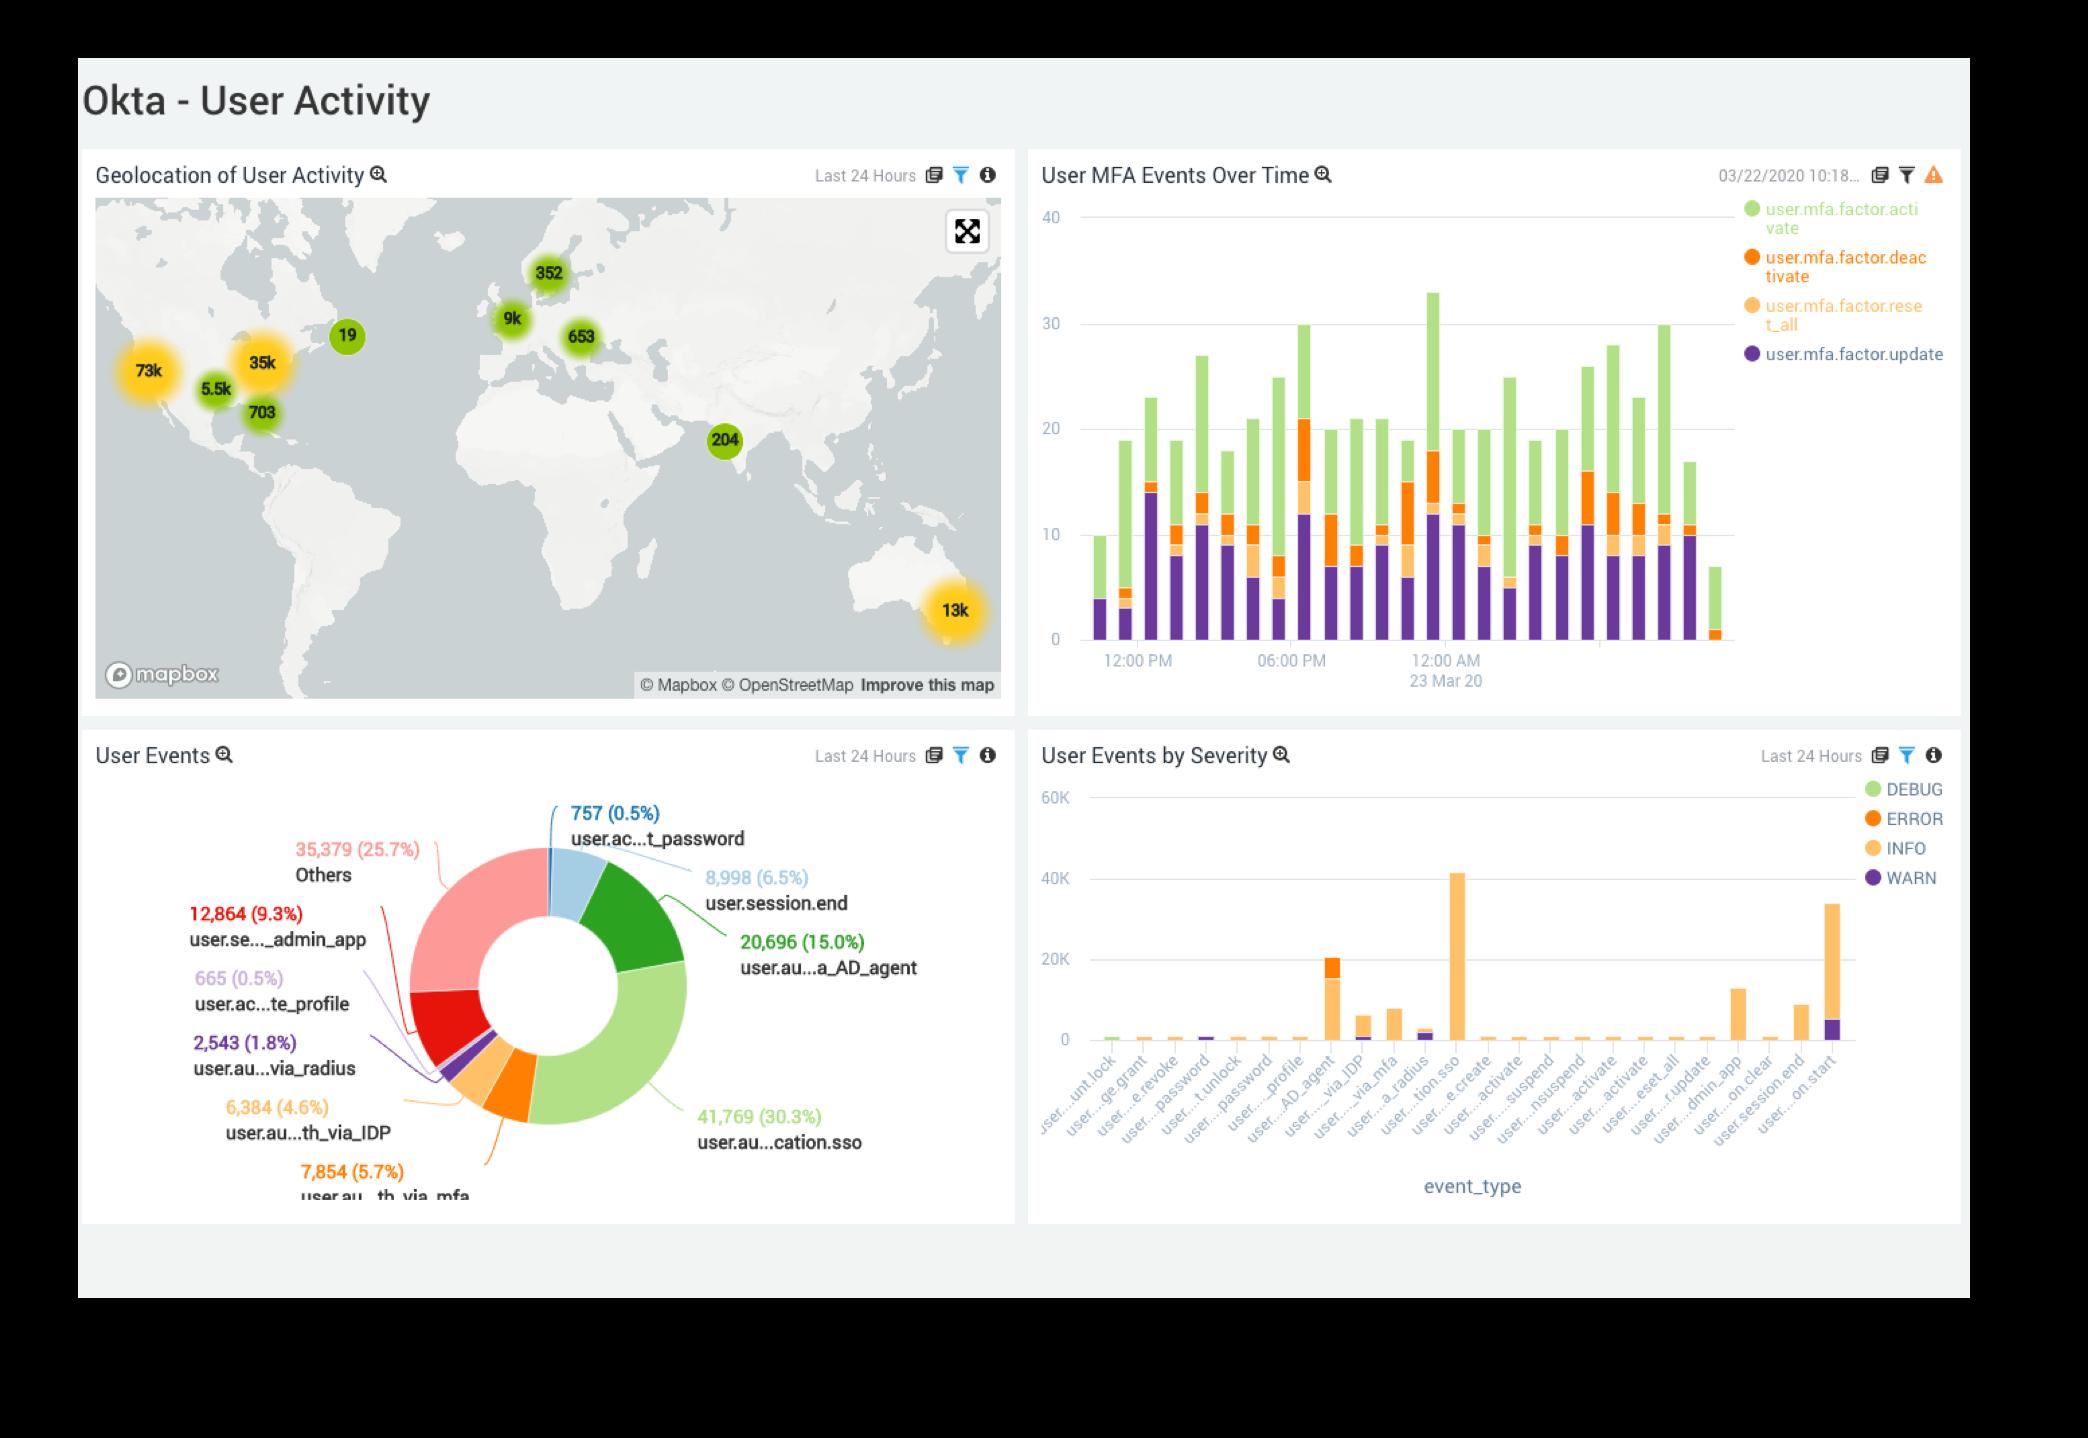 Okta – Troubleshoot user activity and identify insider threats faster